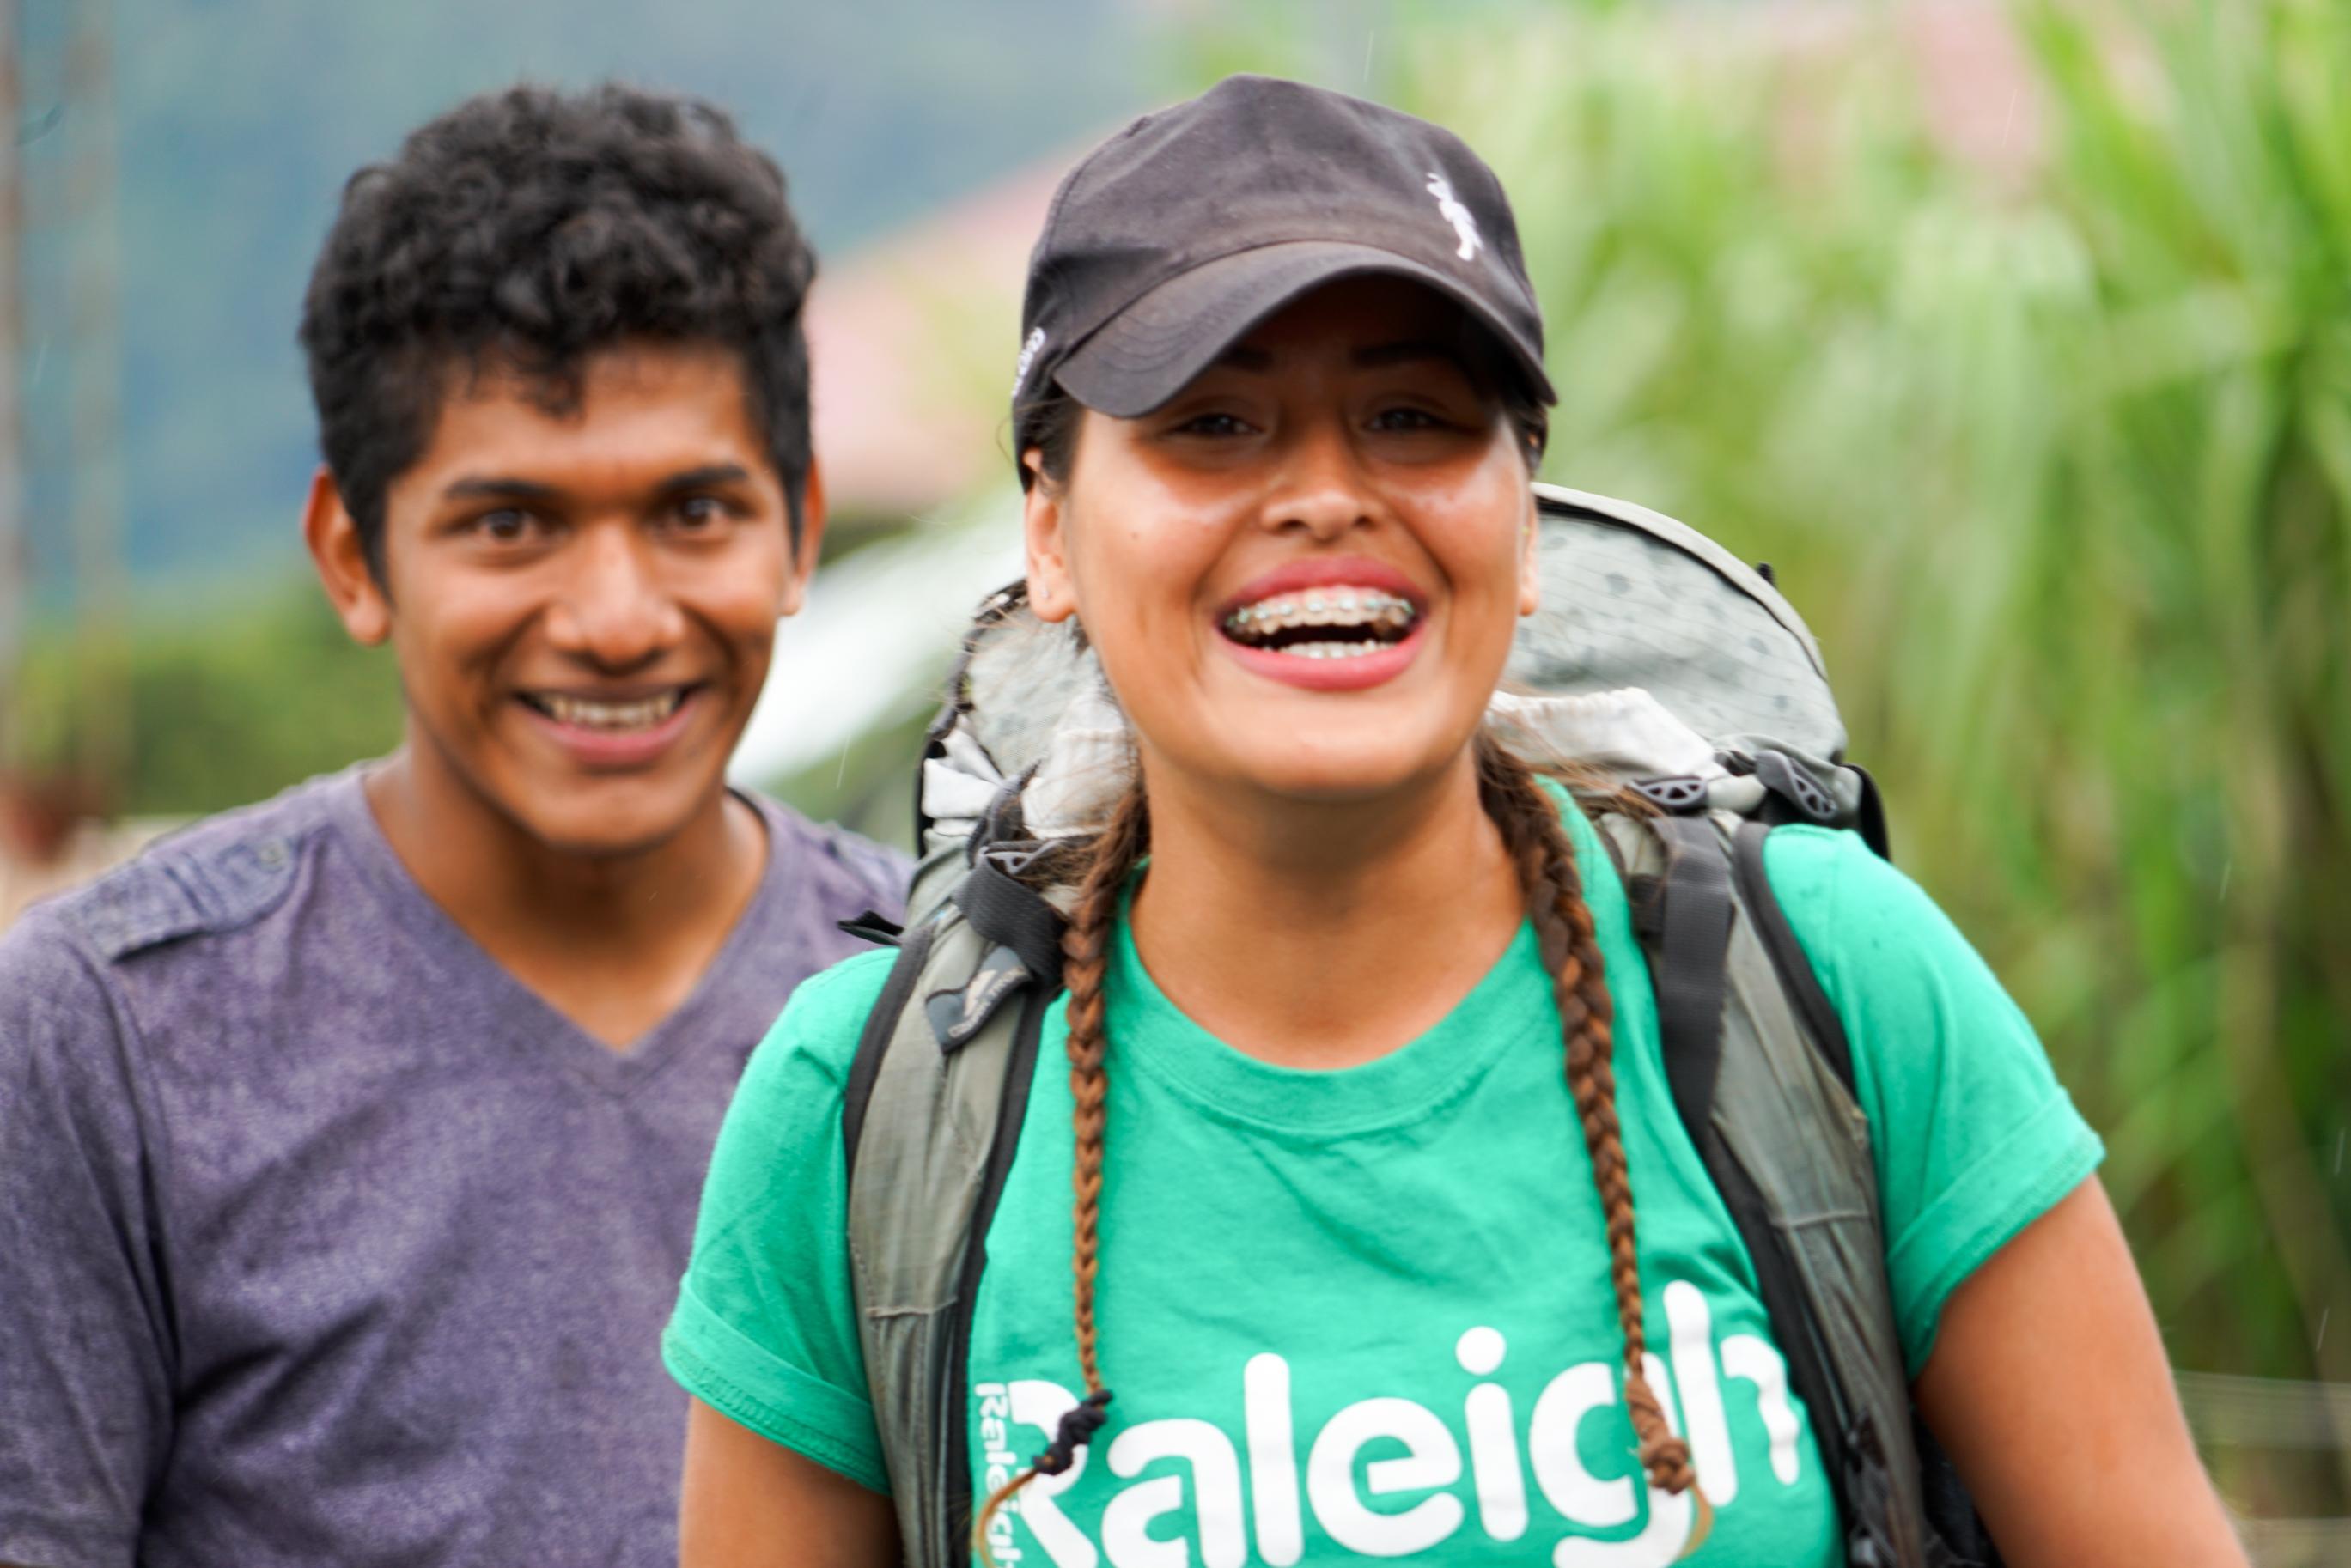 Summer Program - Cultural Organizations | Raleigh International - Summer 2020 Travel Abroad Program in Costa Rica